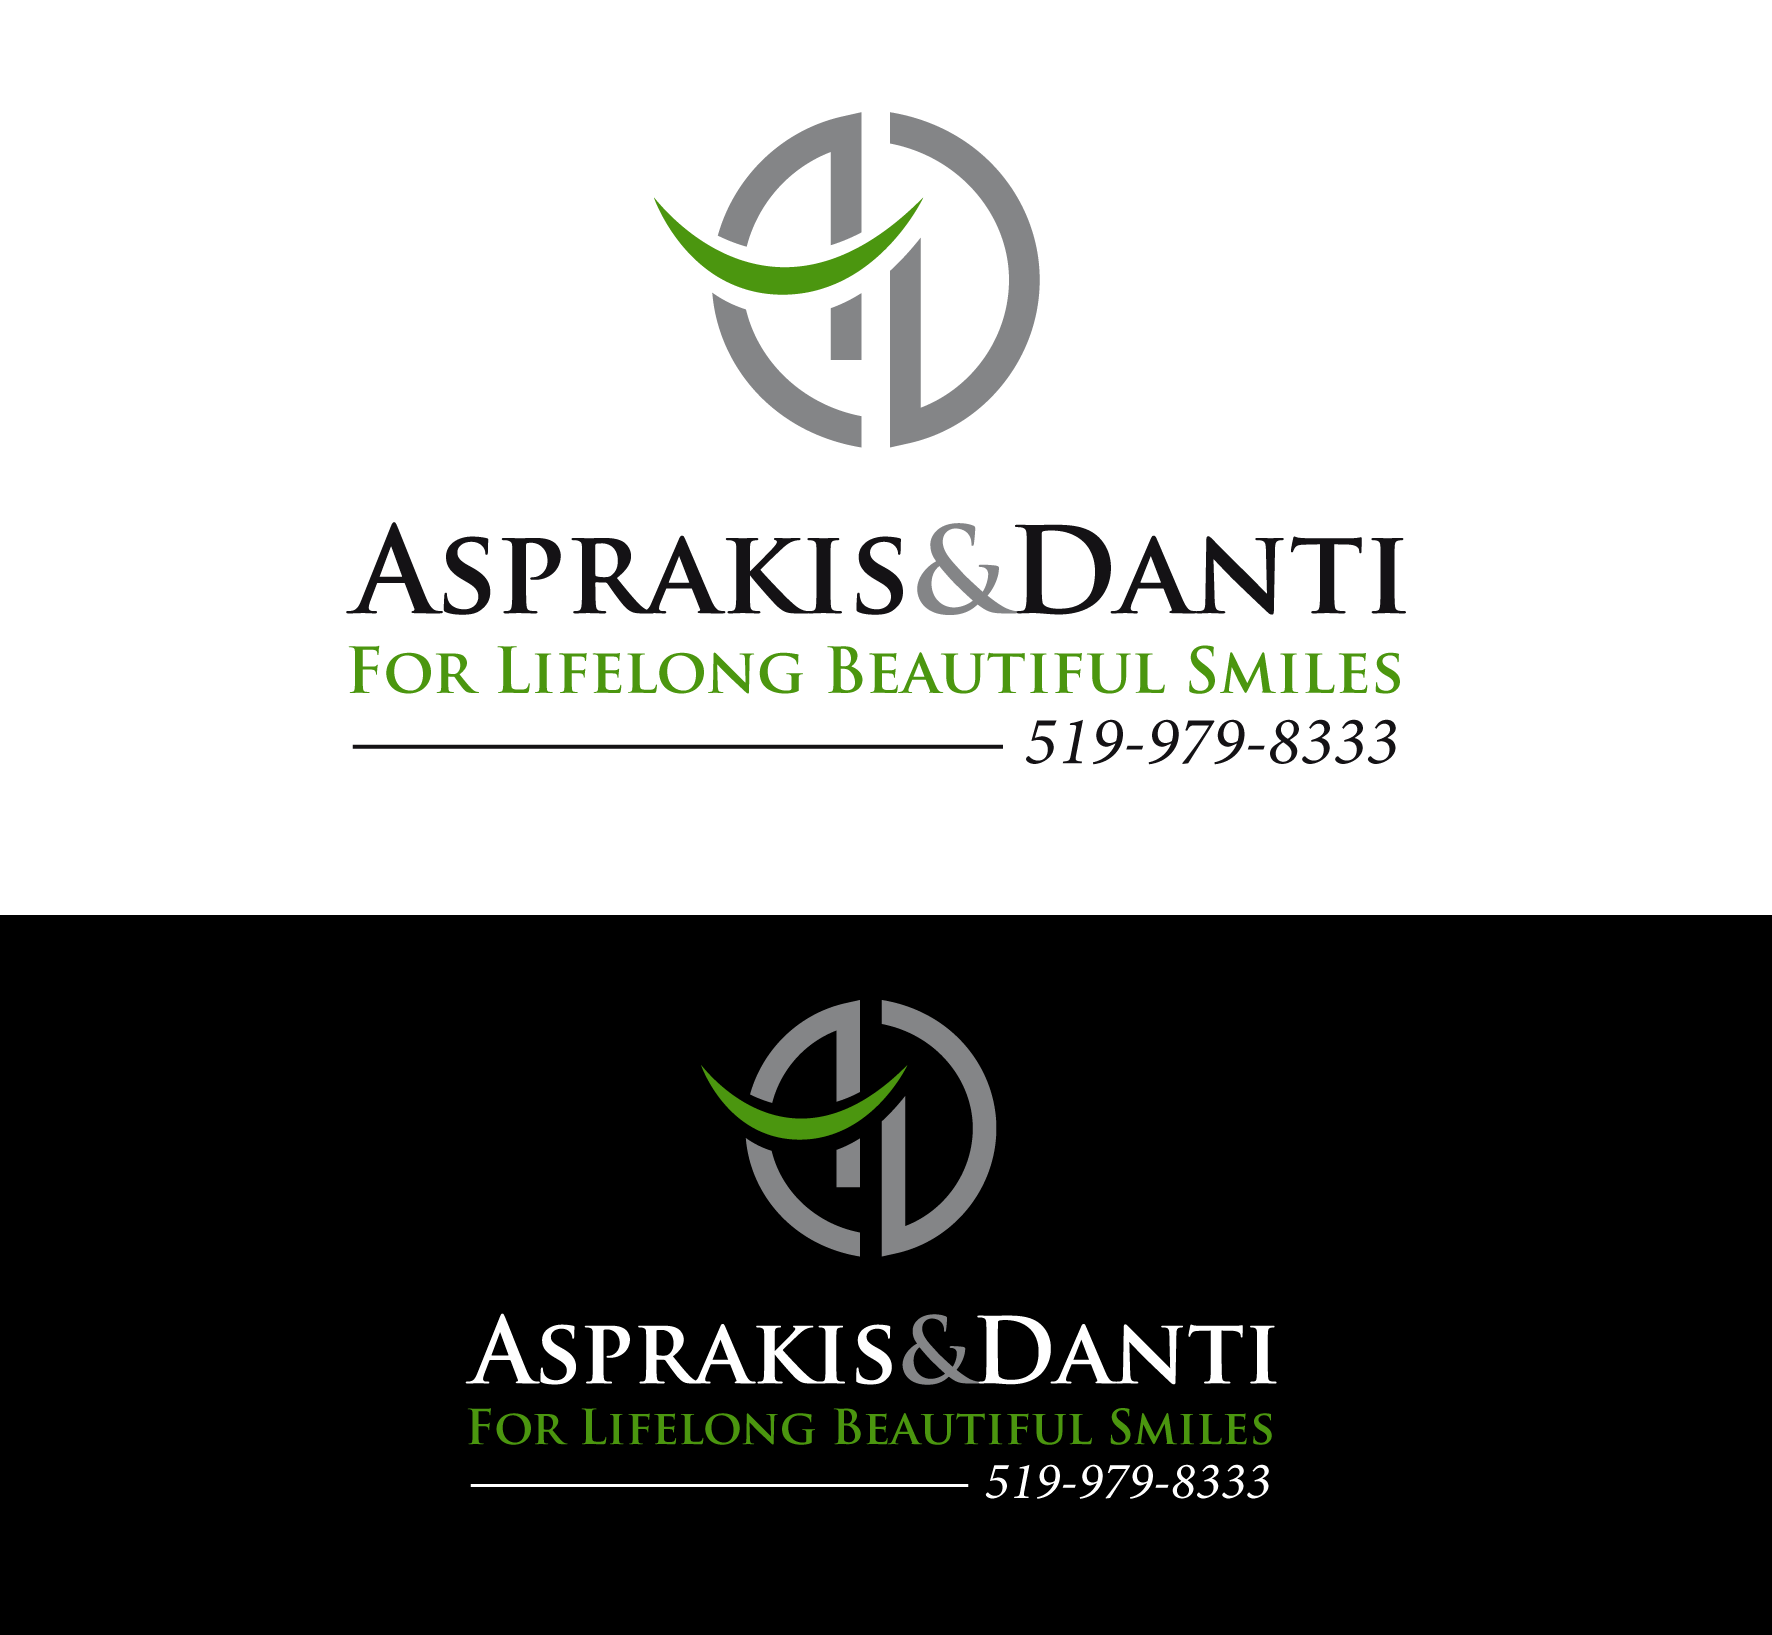 Logo Design by luna - Entry No. 88 in the Logo Design Contest Unique Logo Design Wanted for Asprakis and Danti.